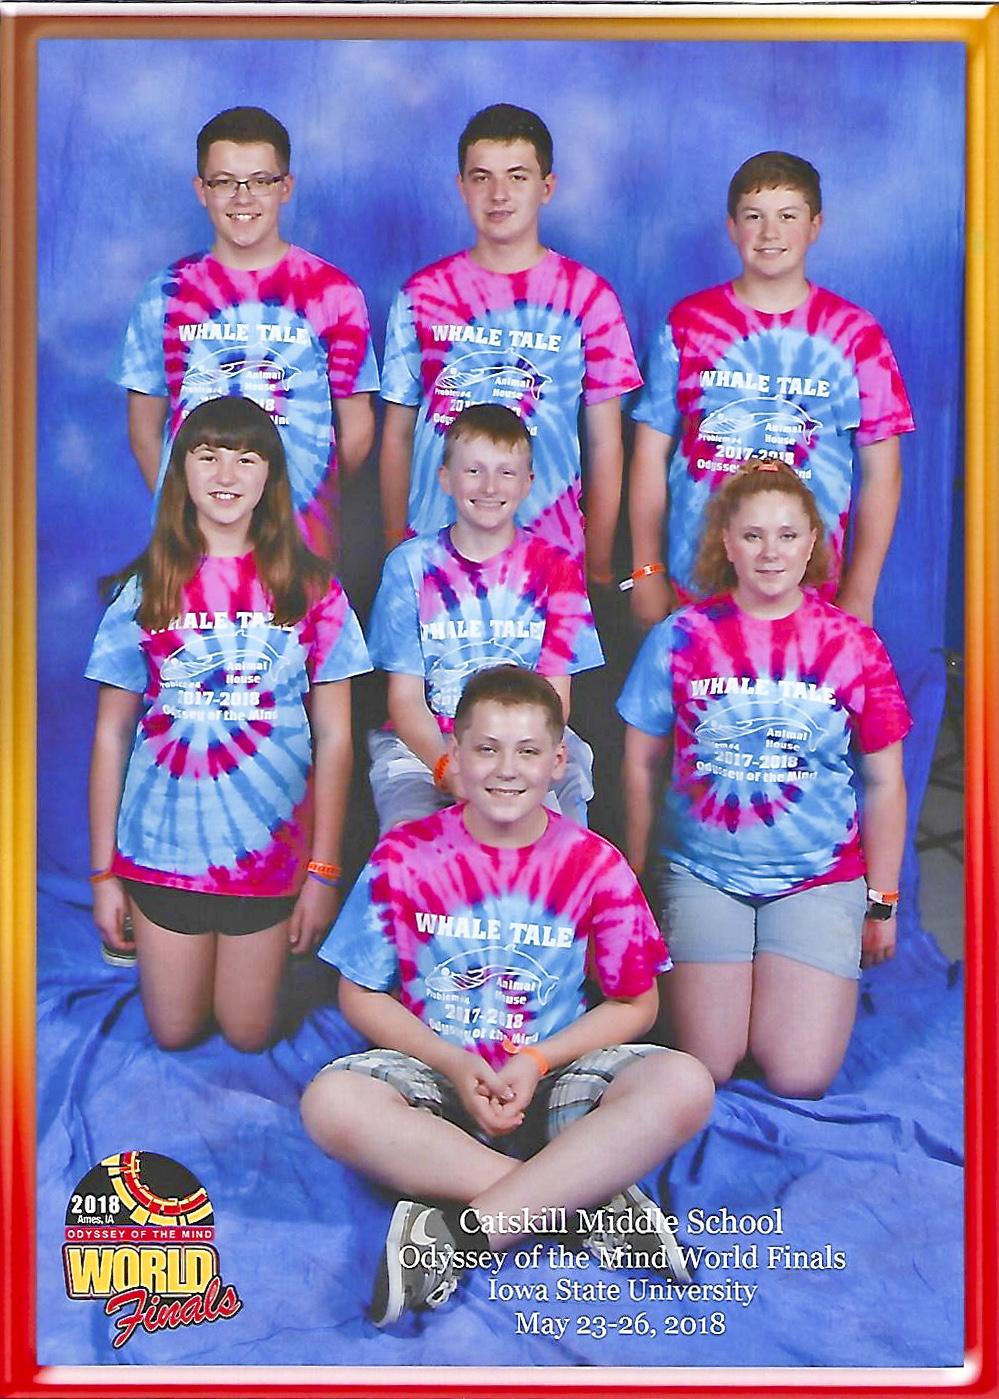 Team Whale Tale team photo at world finals